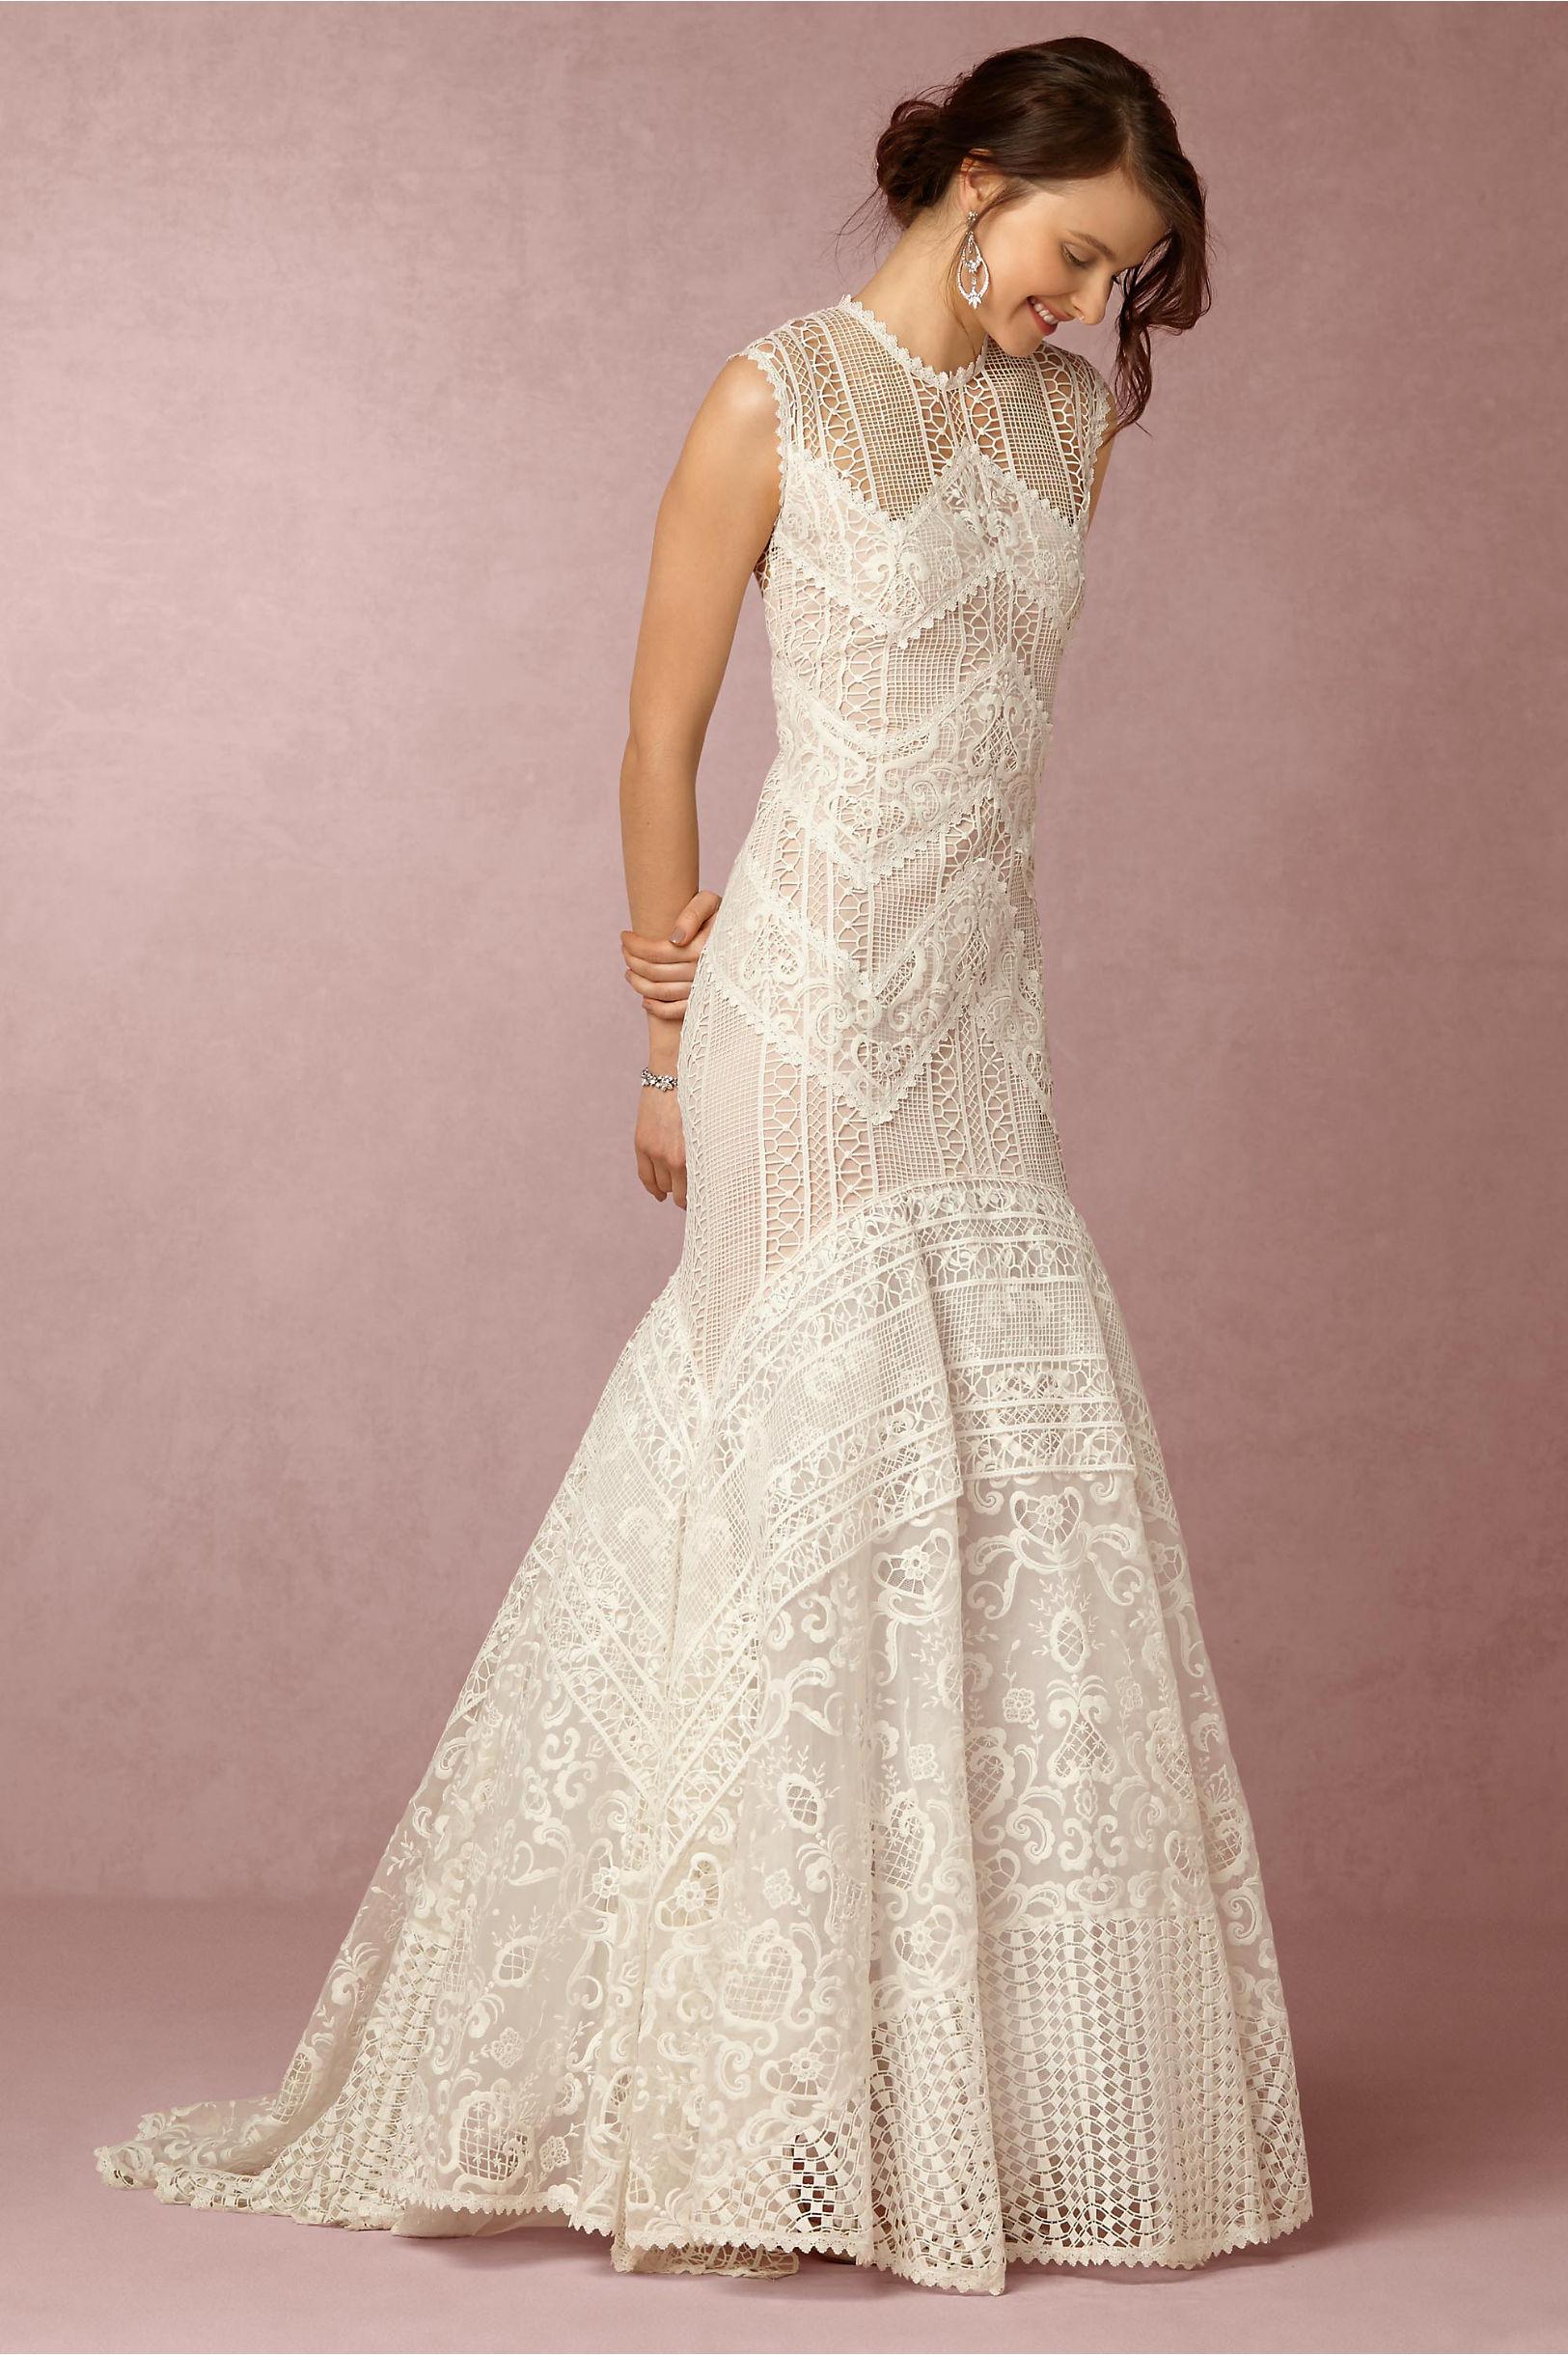 BHLDN Blanca Gown - BHLDN Wedding Gowns